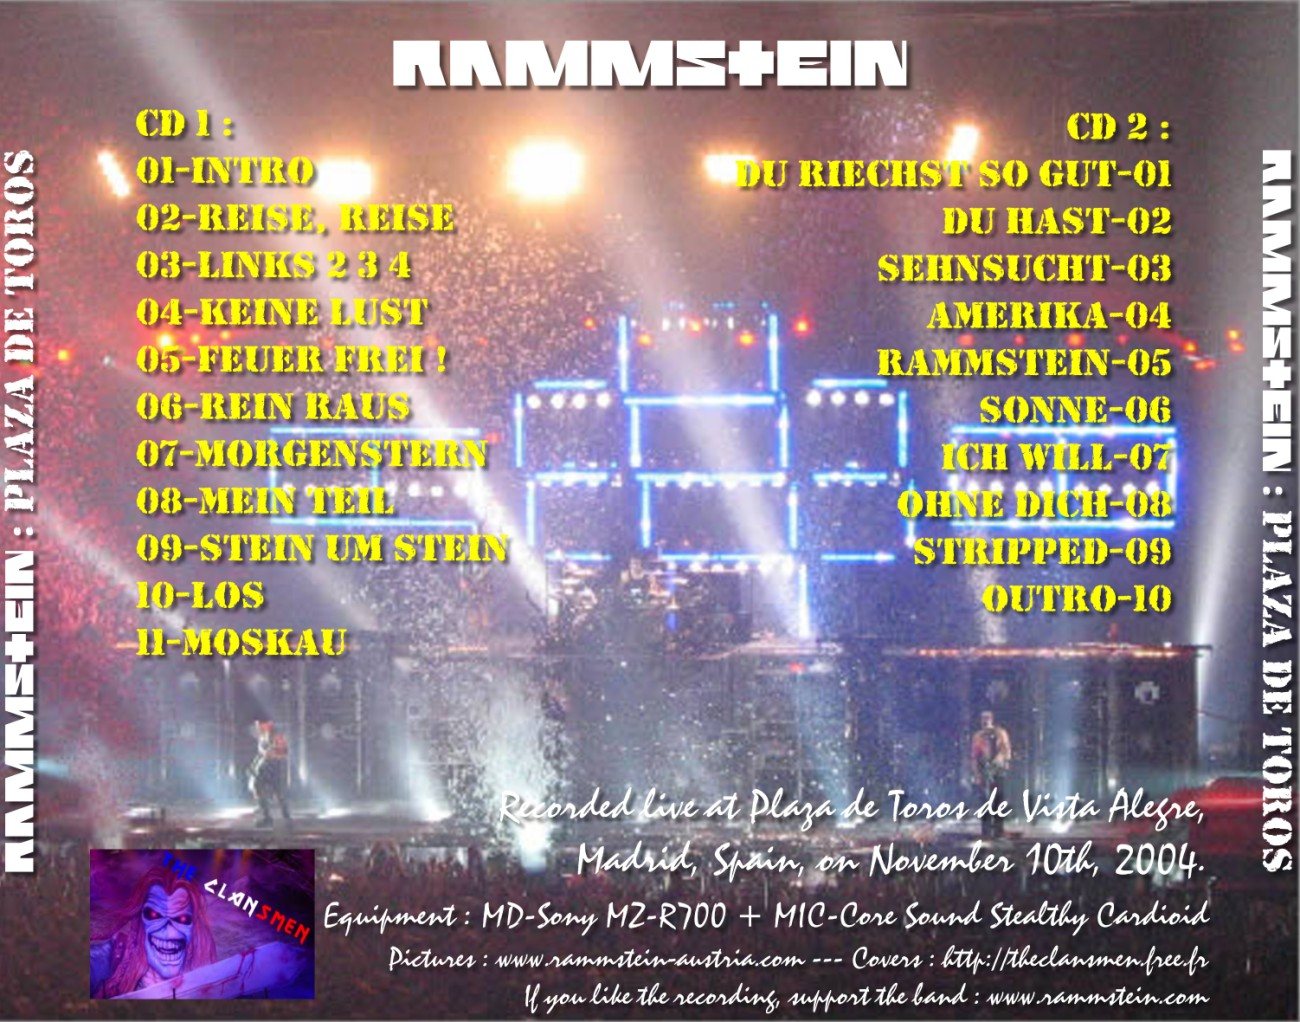 Rammstein - Live In madrid 2004